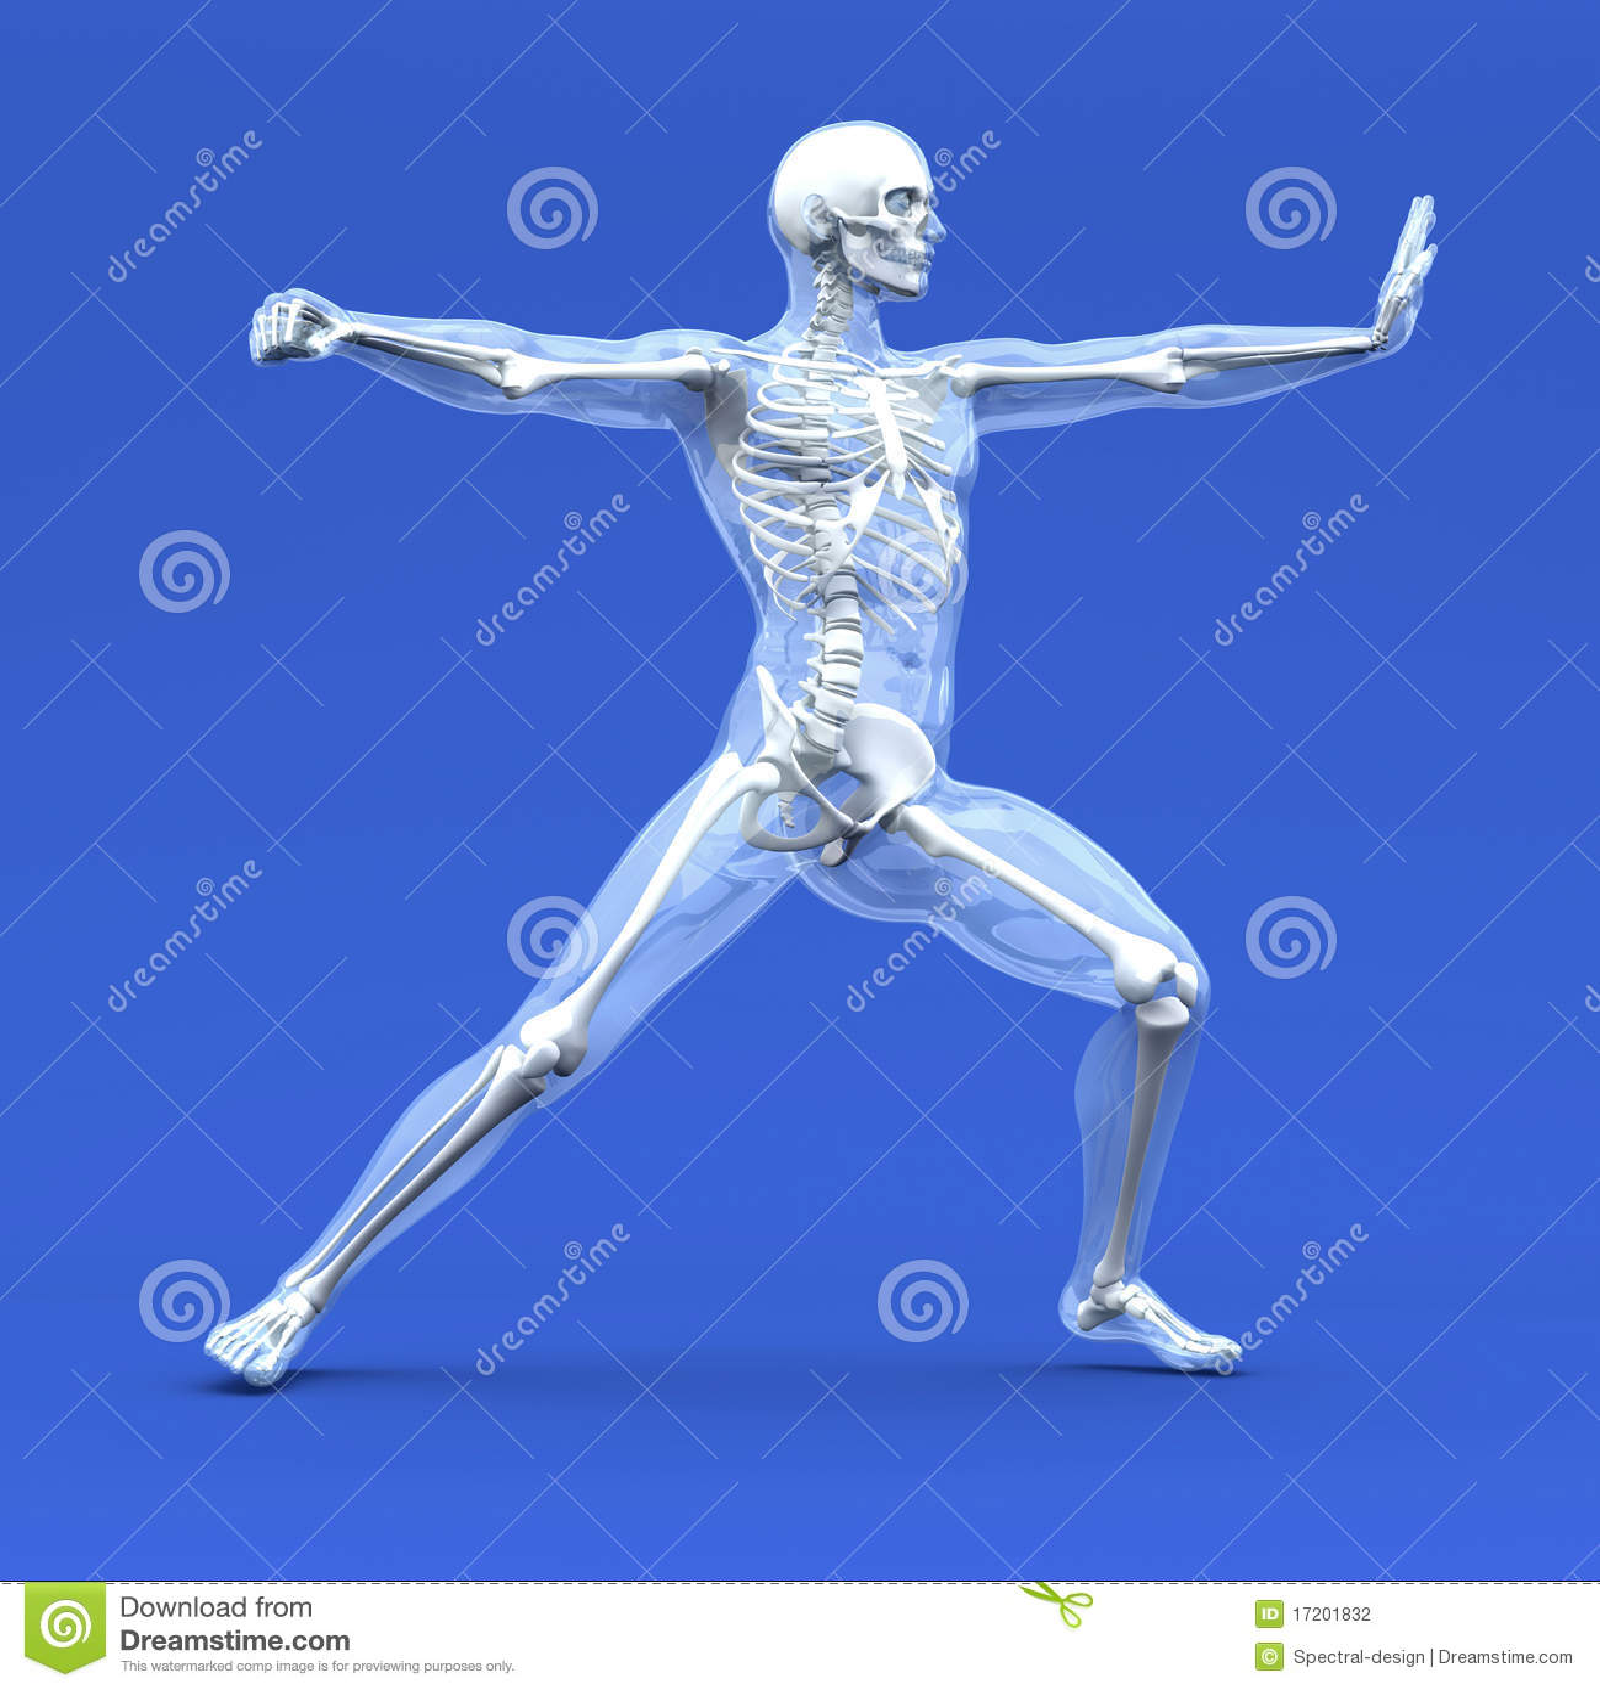 Anatomy for martial artists pdf995